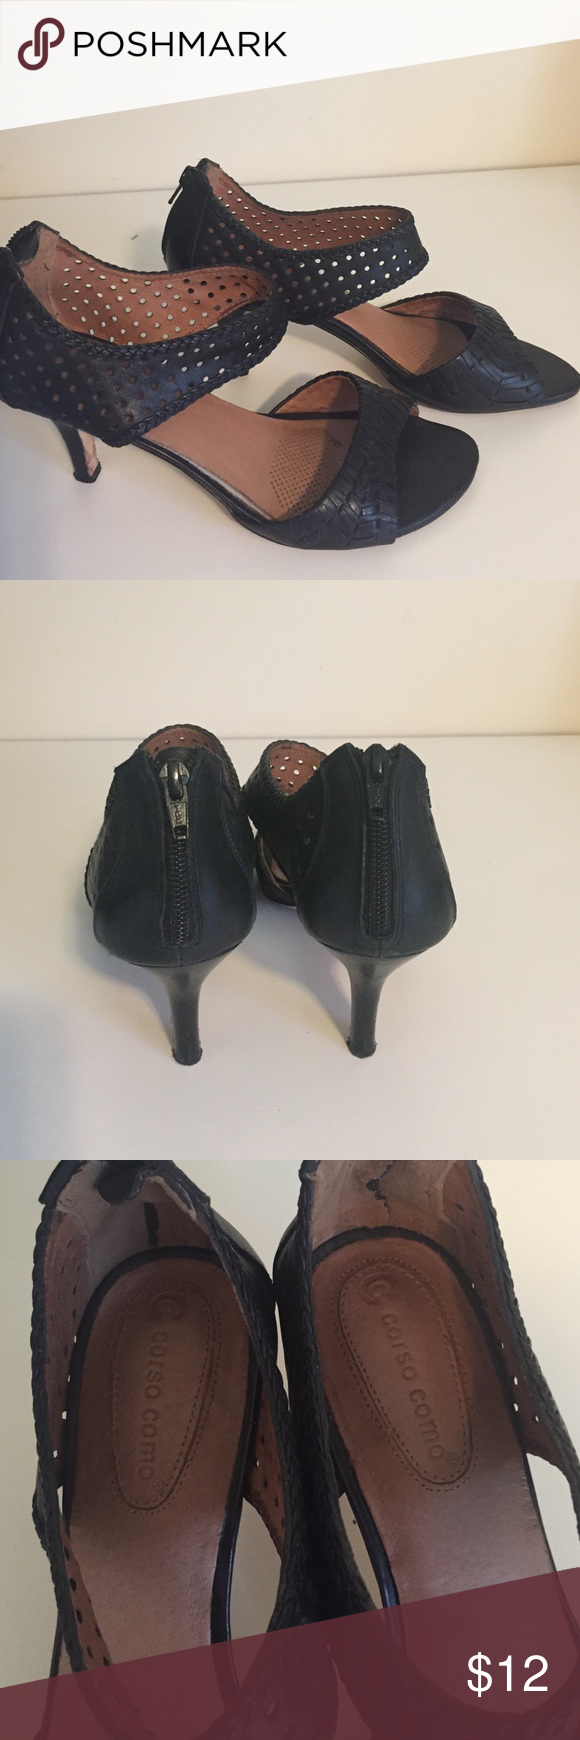 Corsica convo sandals Black with zippered back Corso Como Shoes Sandals